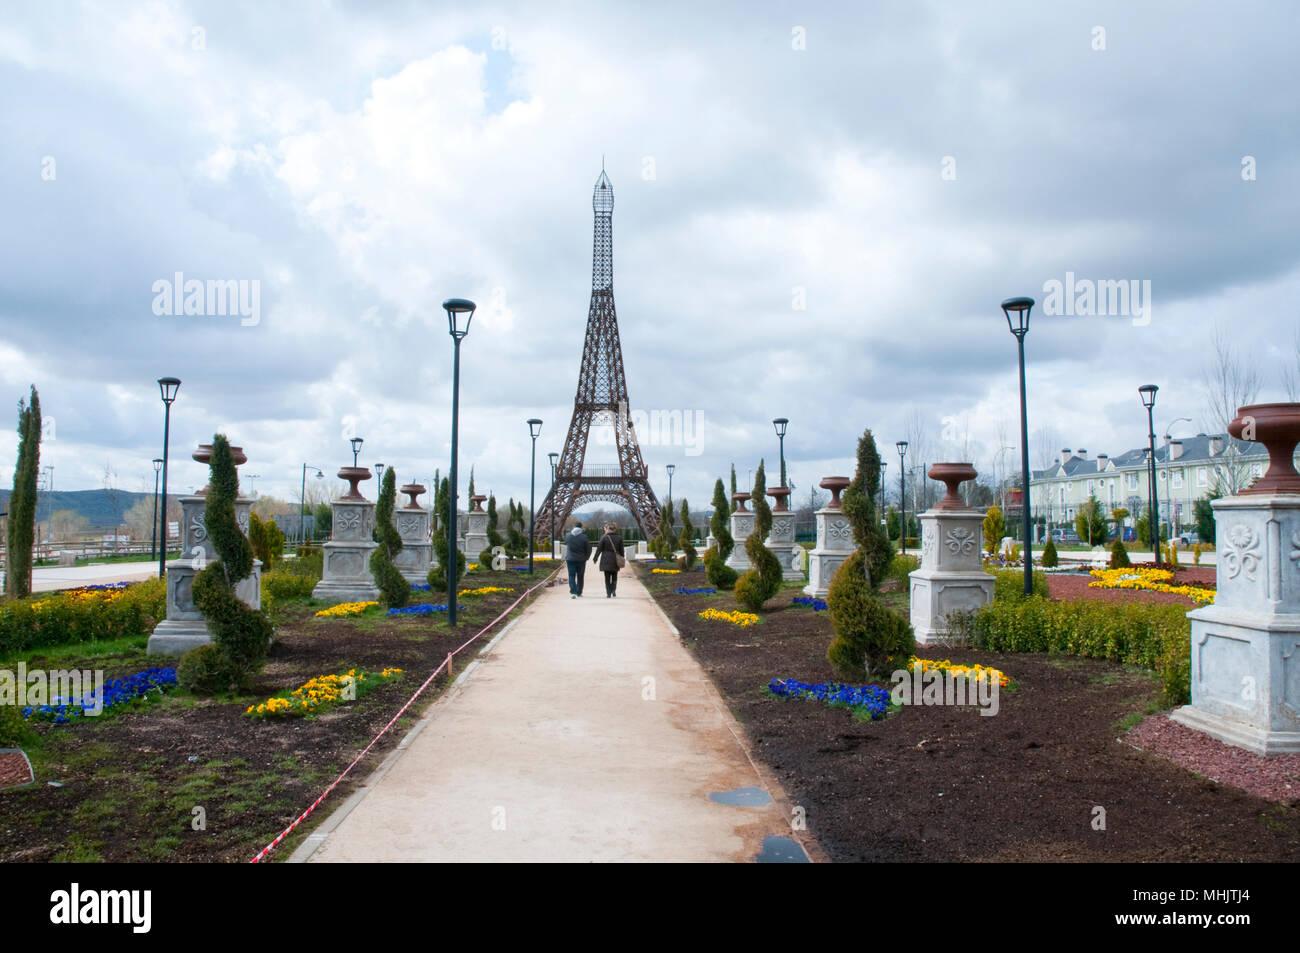 Eiffel Tower in Parque Europa. Torrejon de Ardoz, Madrid province, Spain. - Stock Image